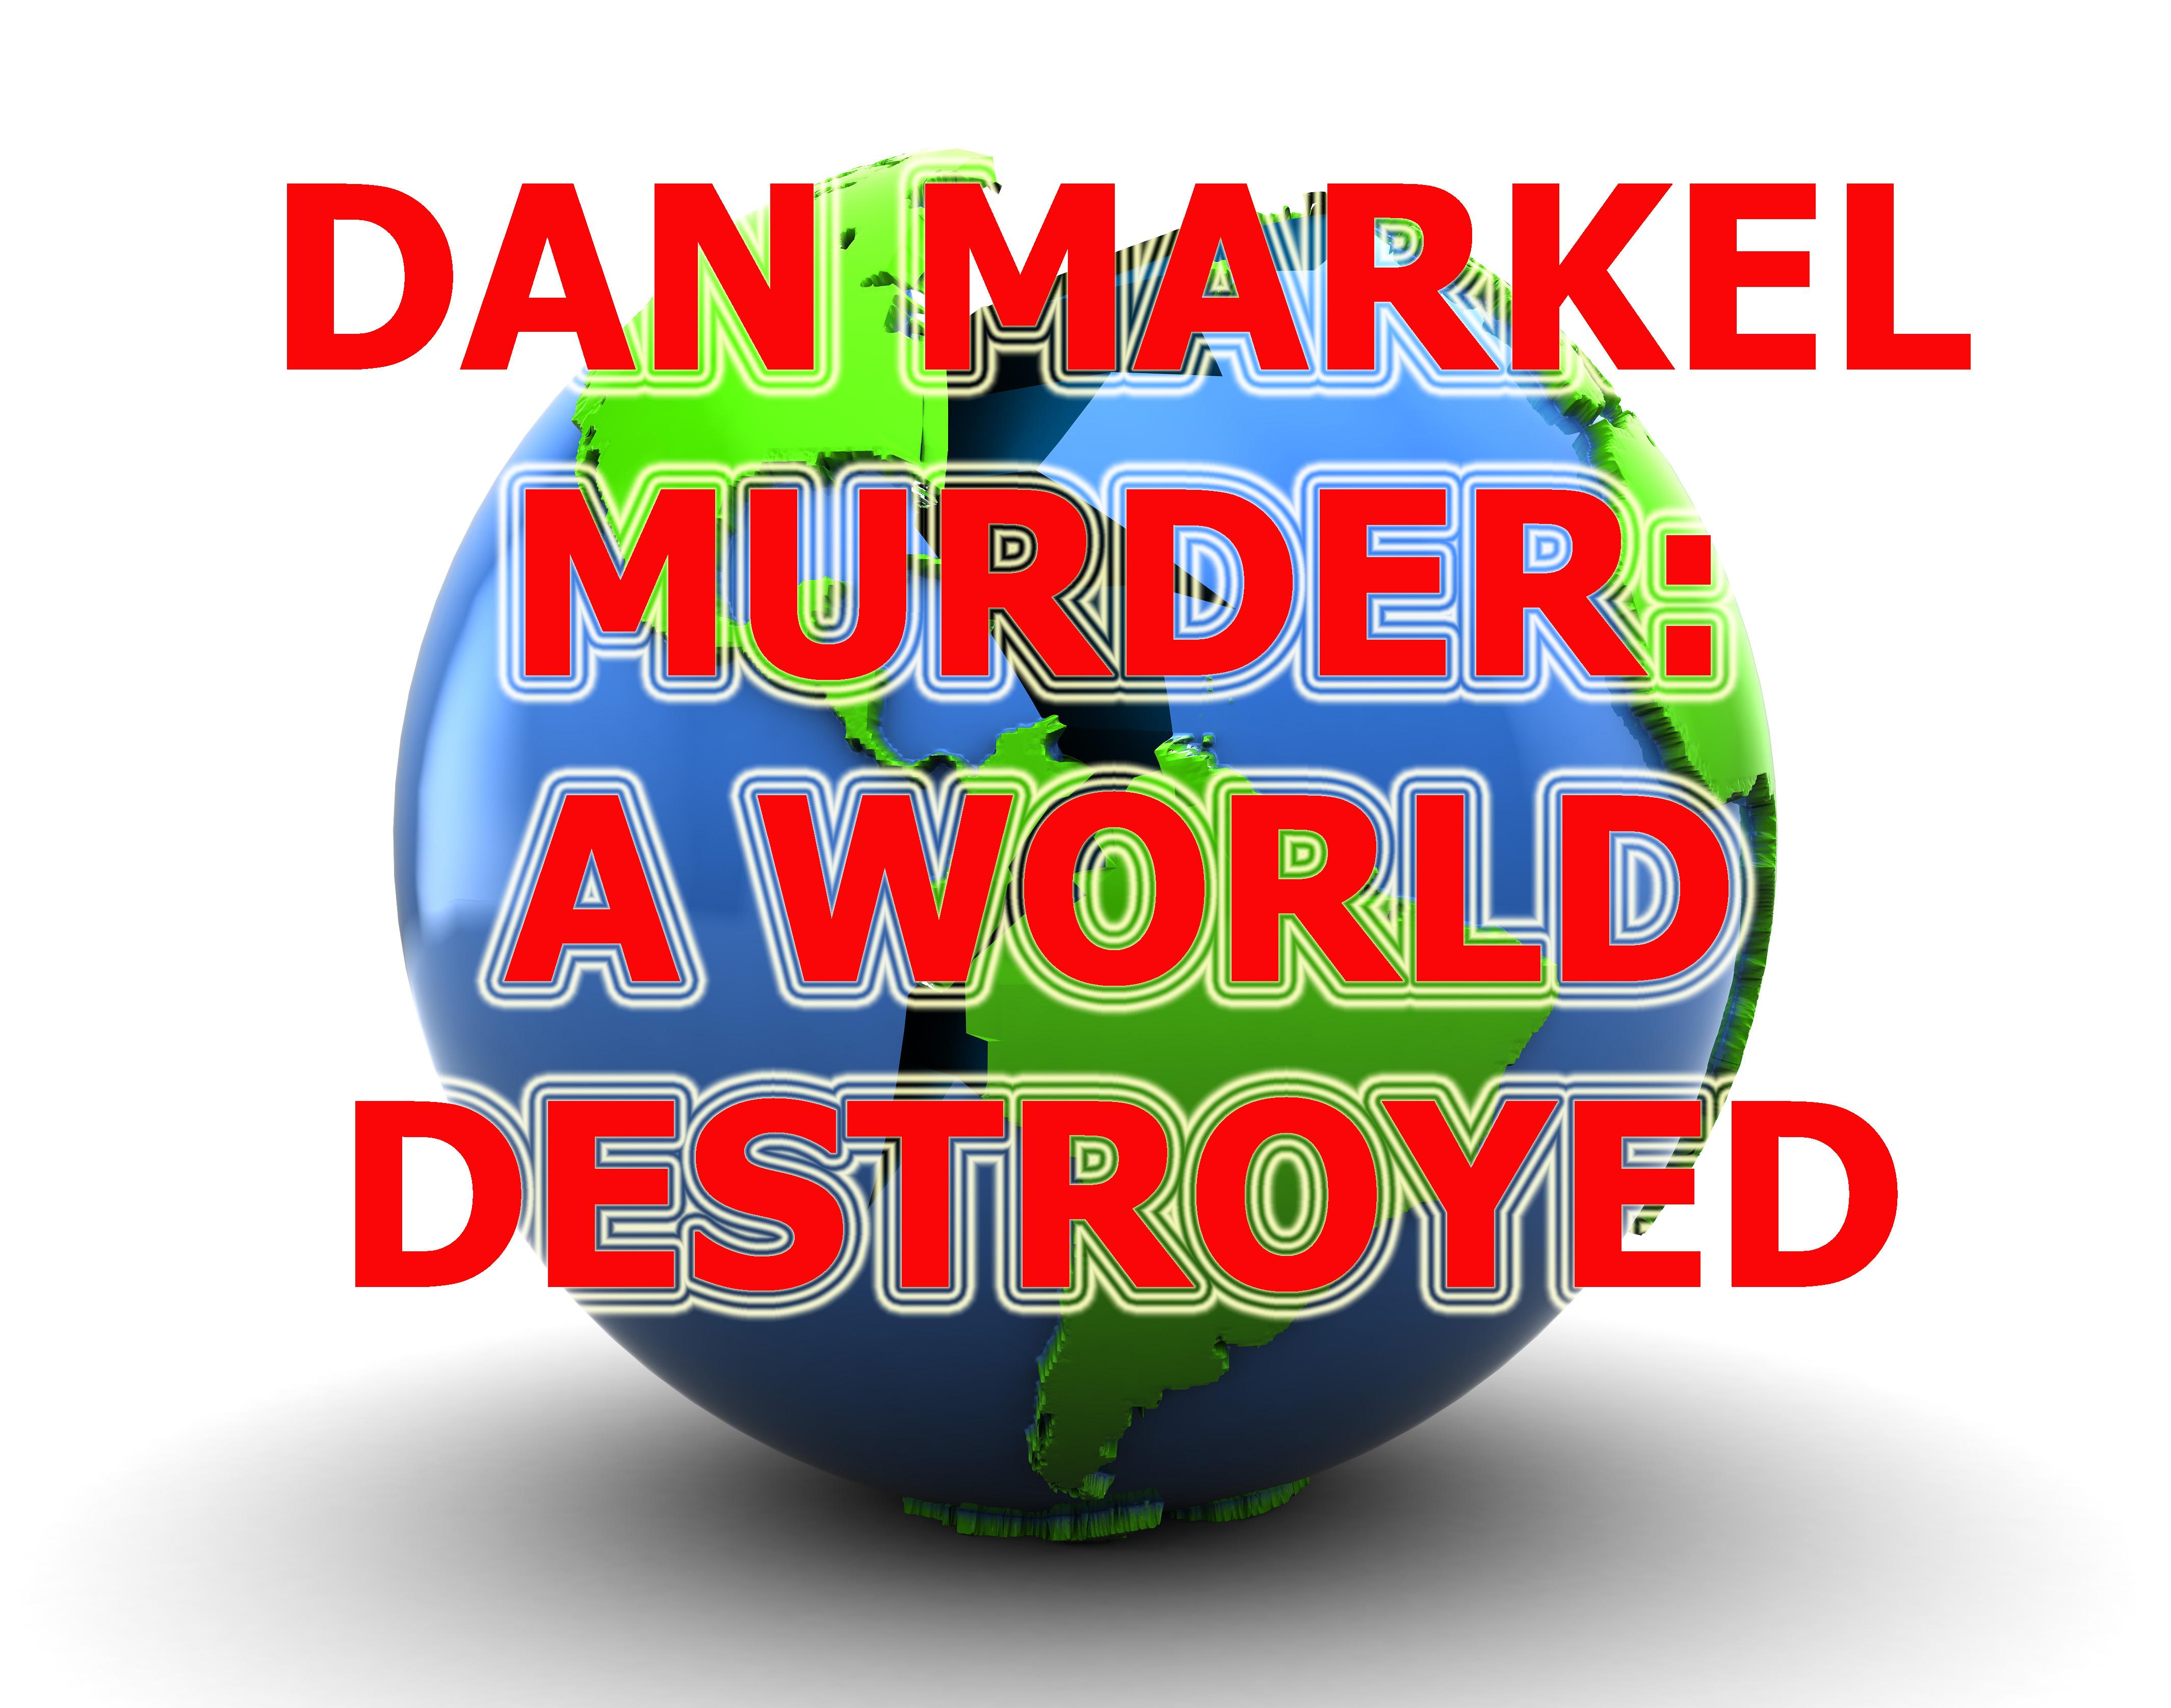 The Murder of Dan Markel: A World Destoryed